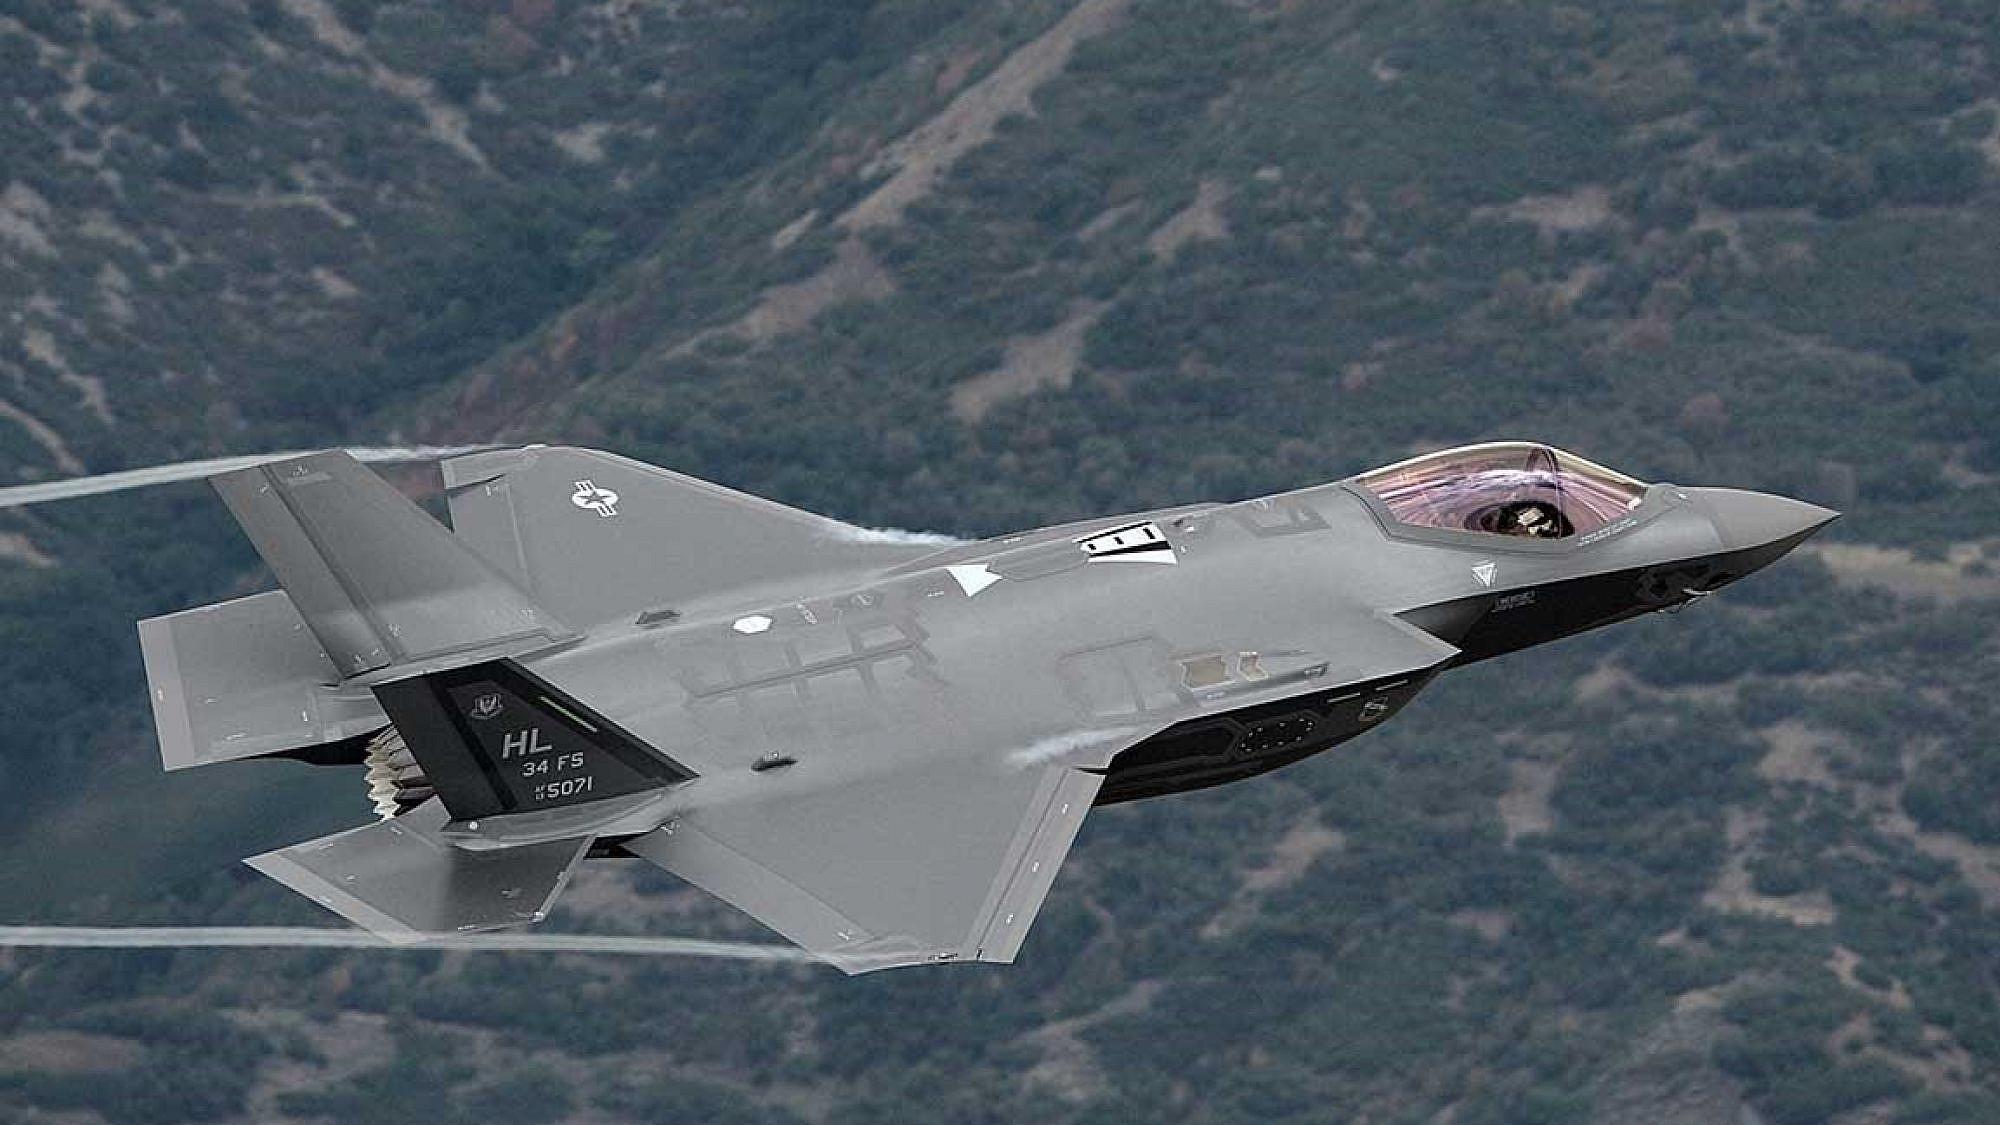 Why Is Washington Seeking To Block The Sale Of F-35